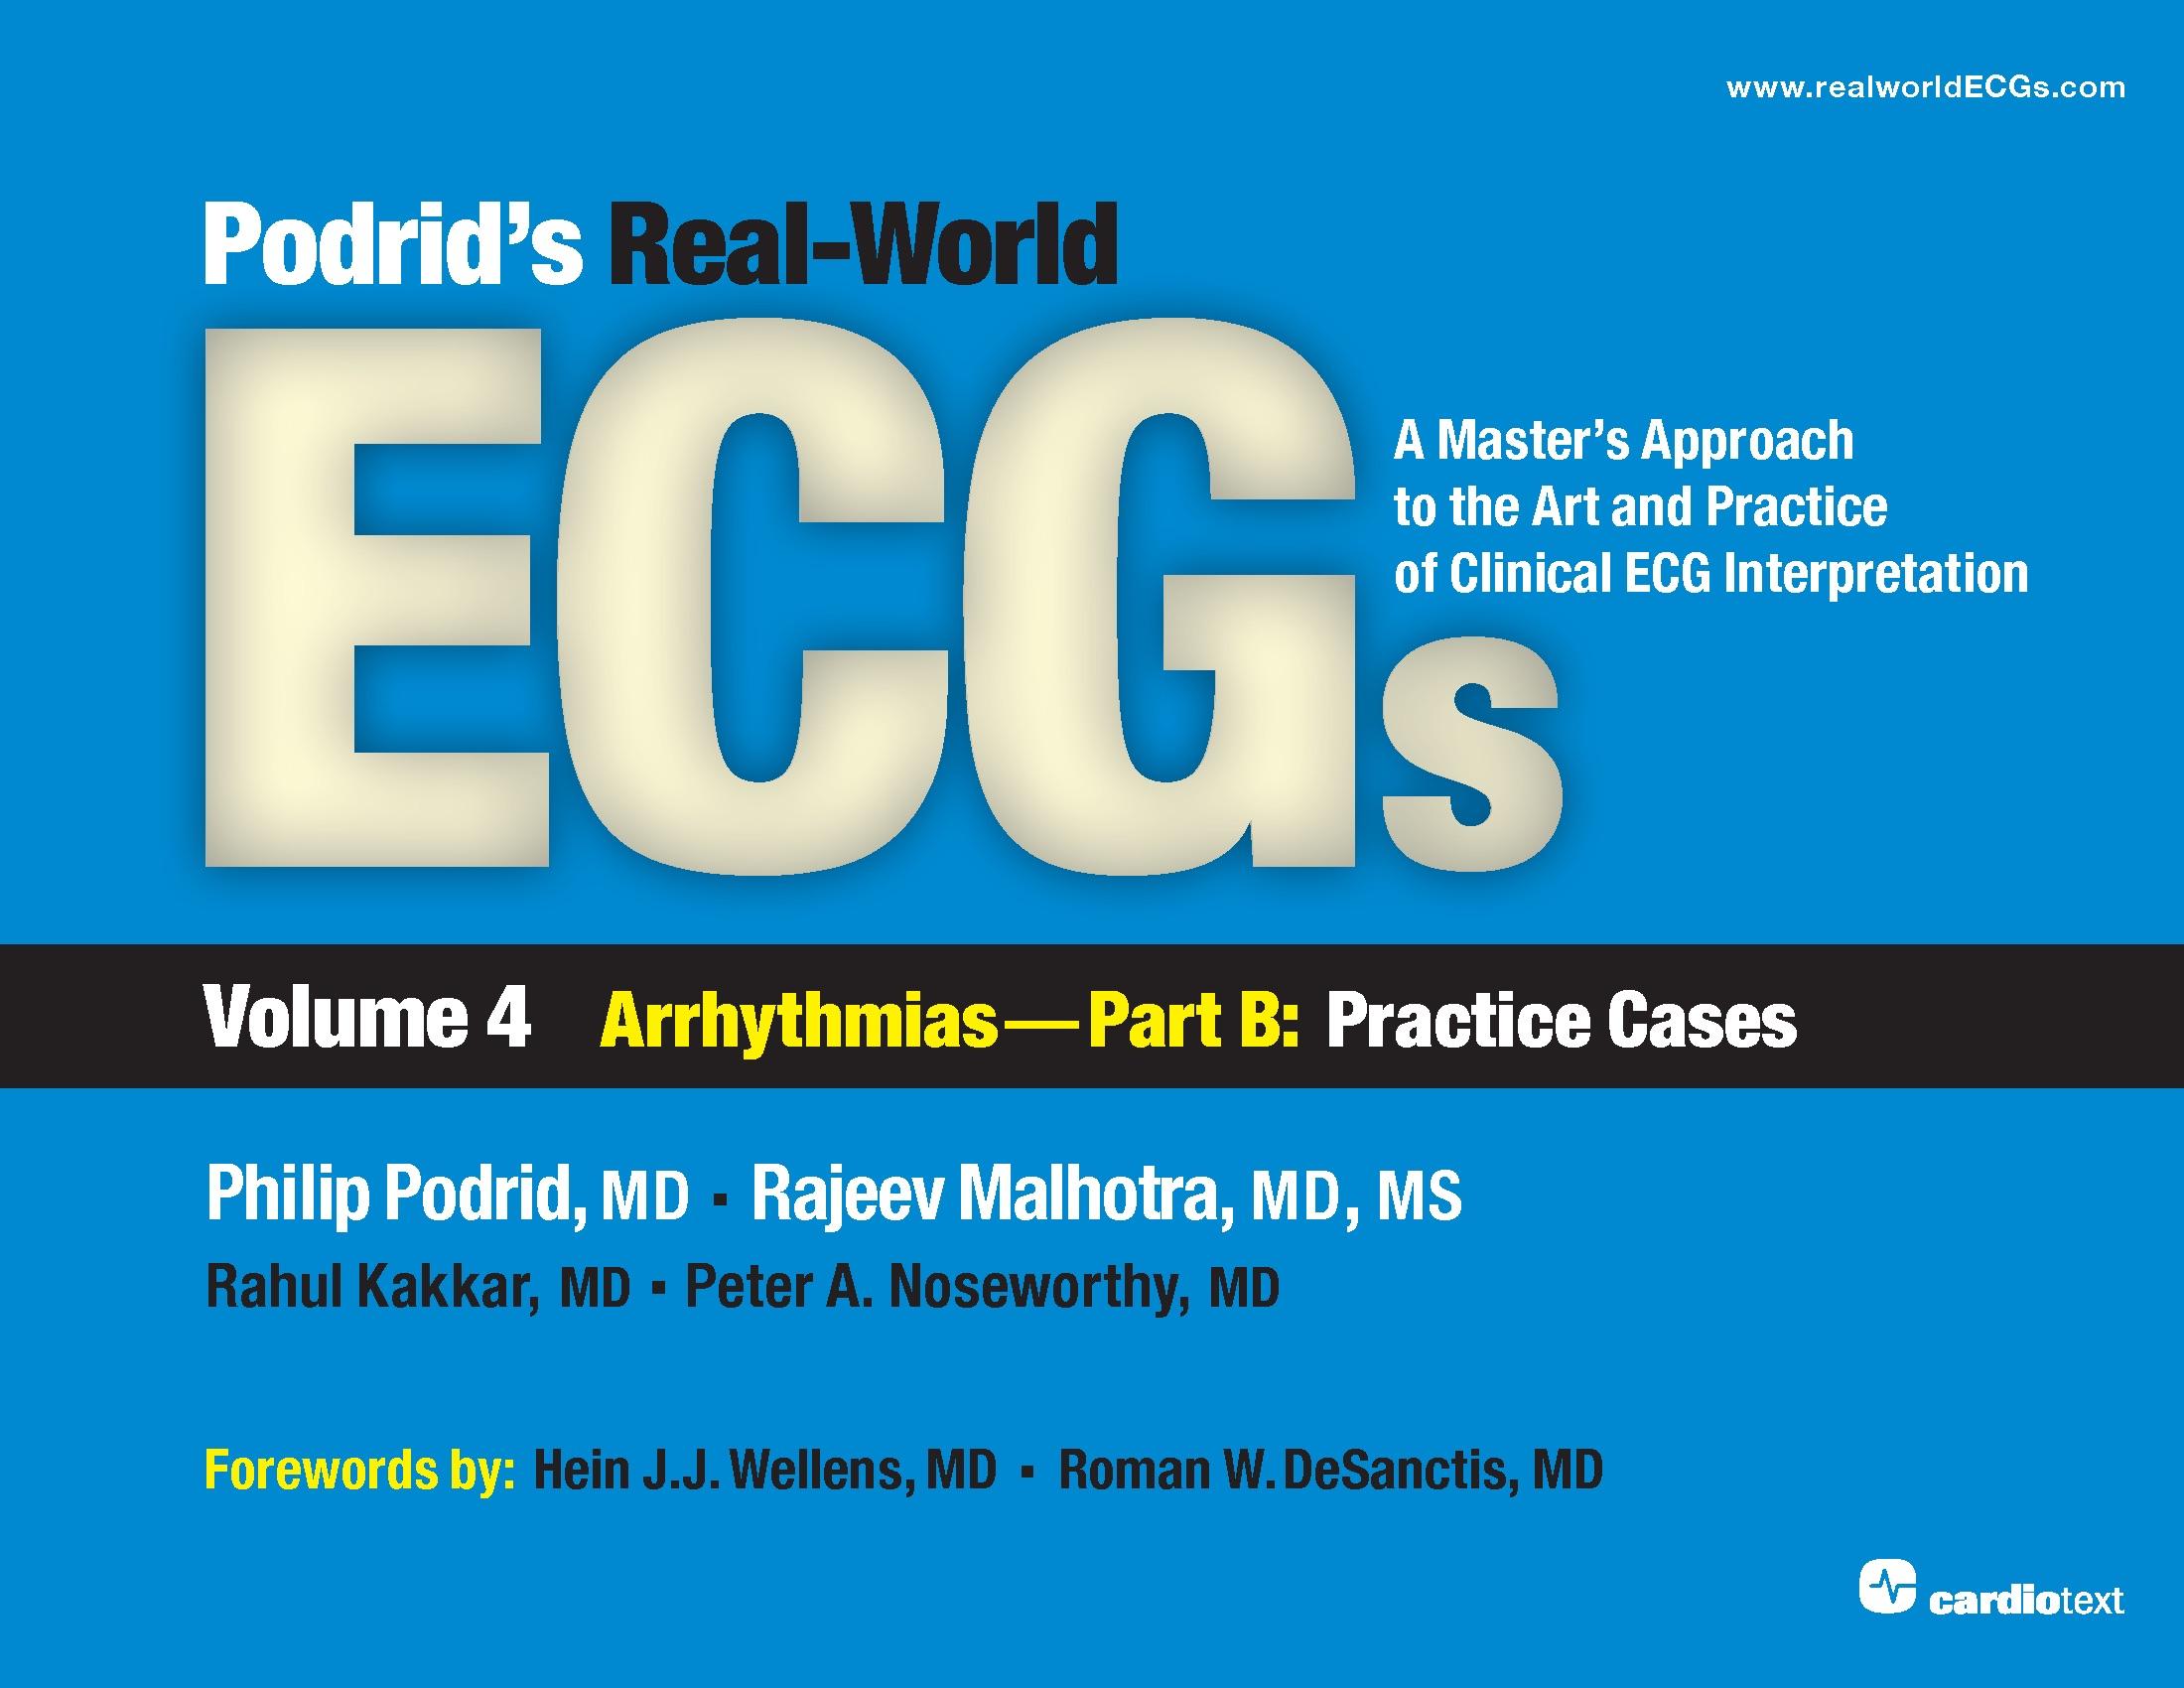 Podrid's Real-World ECGs Volume 4B